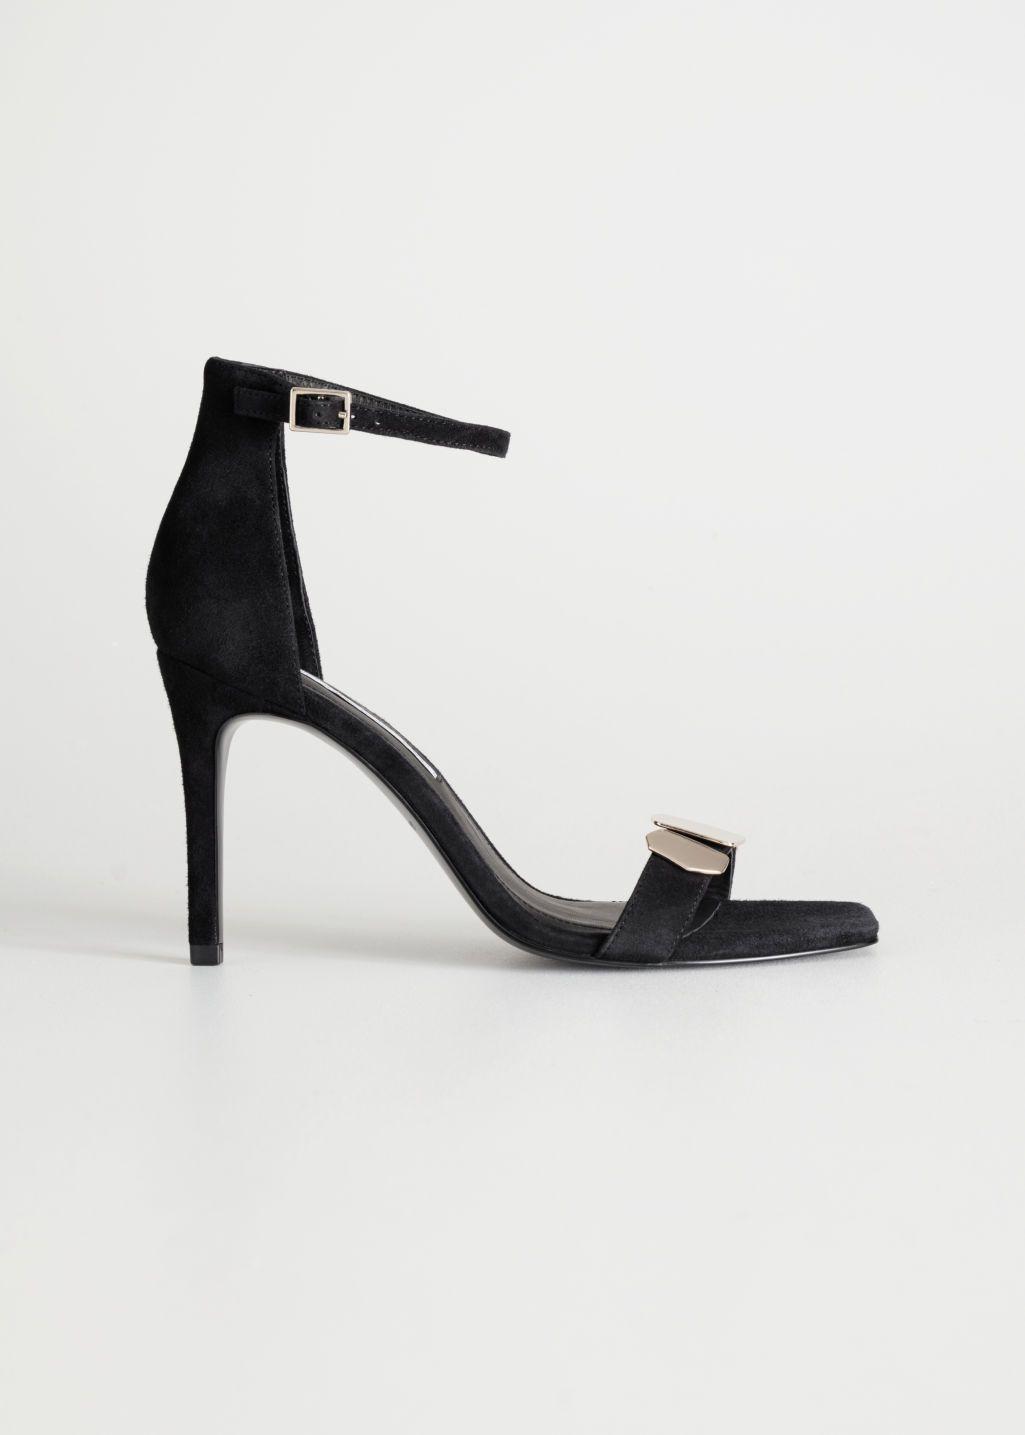 56d5cbd7920 Suede Square Toe Heeled Sandals